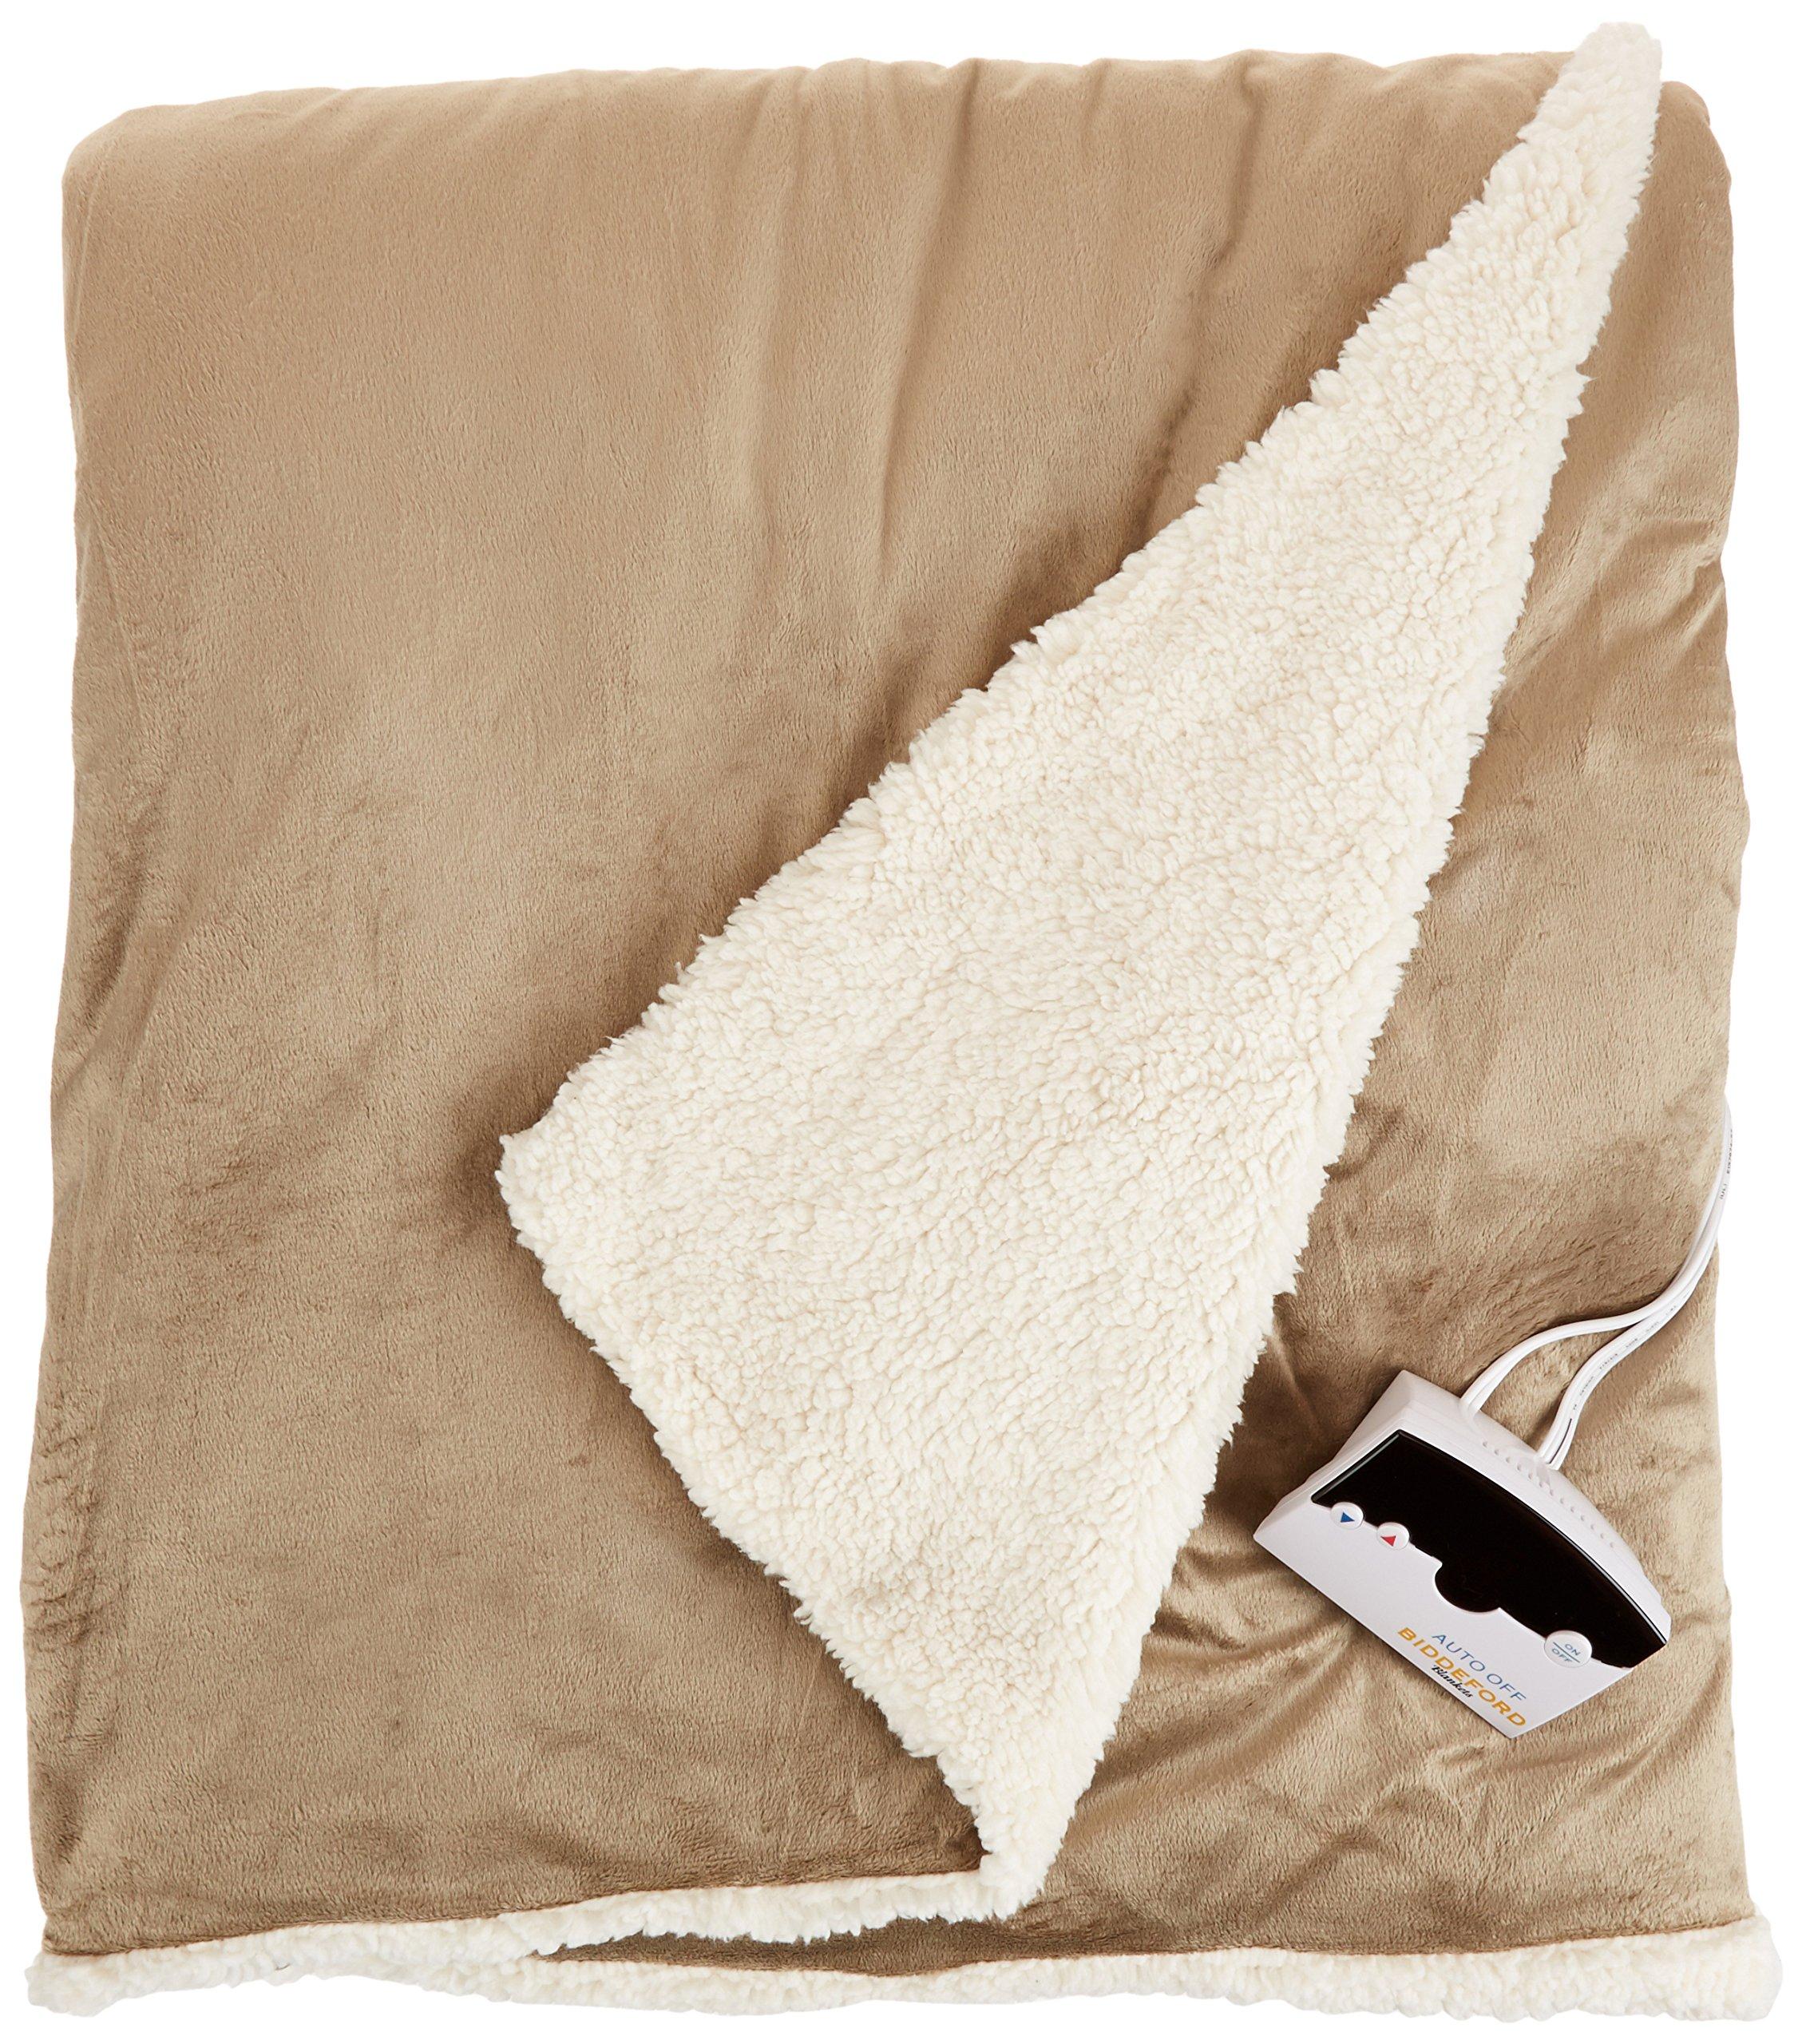 Biddeford 6001-9051136-713 Electric Heated Micro Mink/Sherpa Blanket, Full, Linen by Biddeford